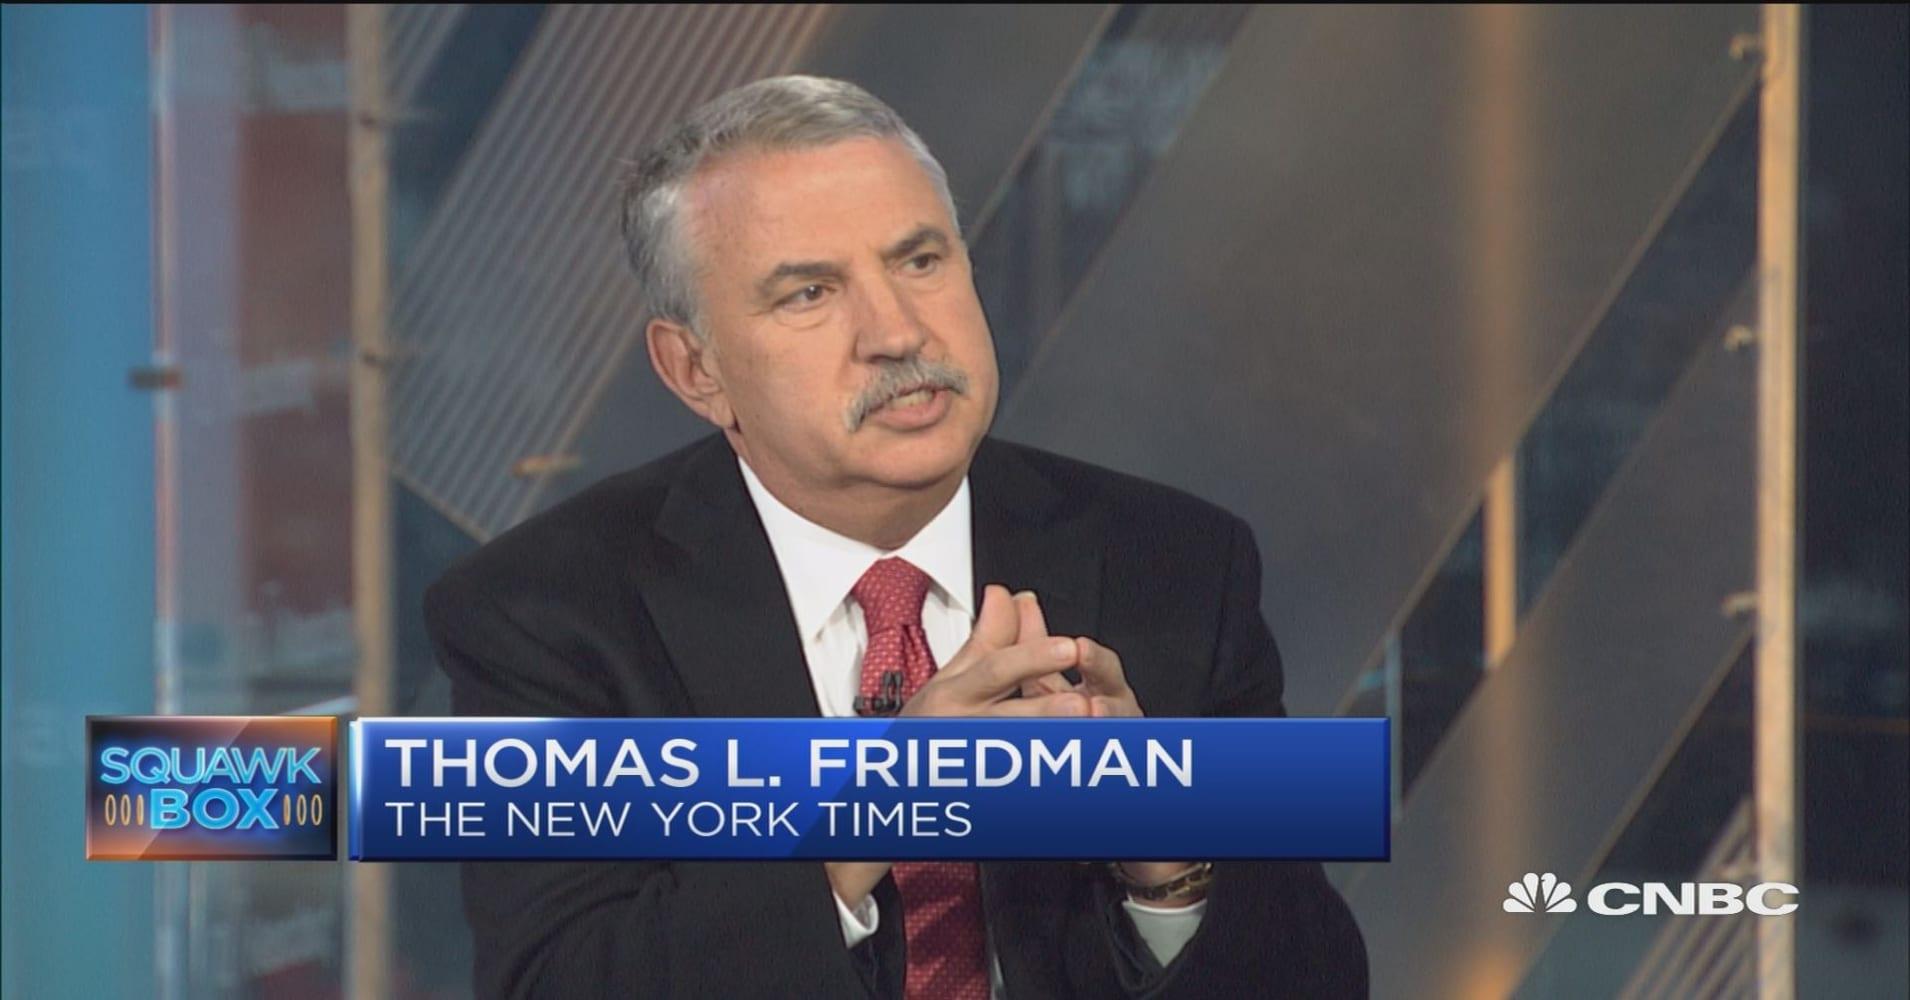 thomas friedman vs richard florida